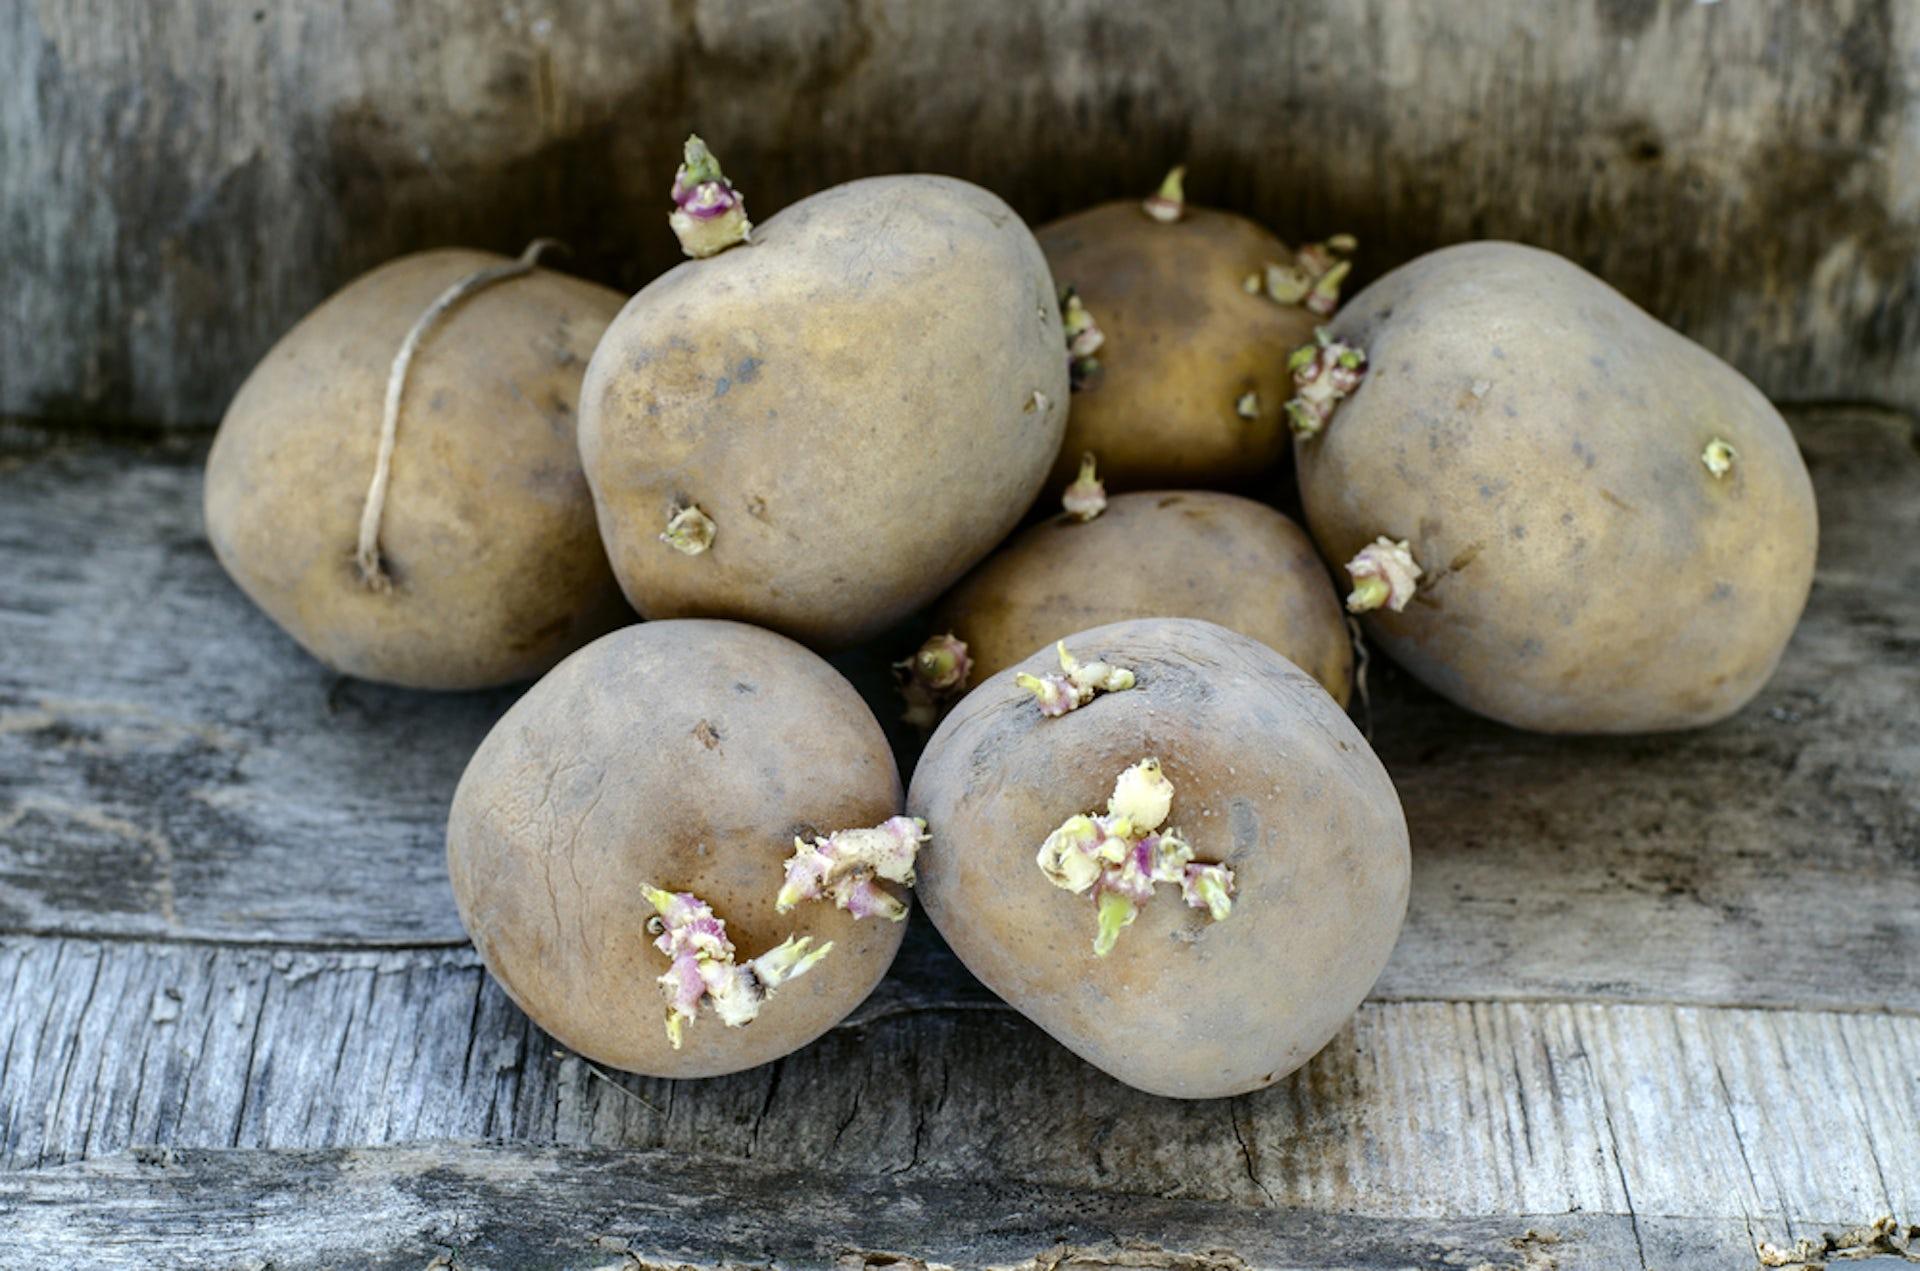 Poison Potato Sprouted Potato Disadvantage For Health In Hindi